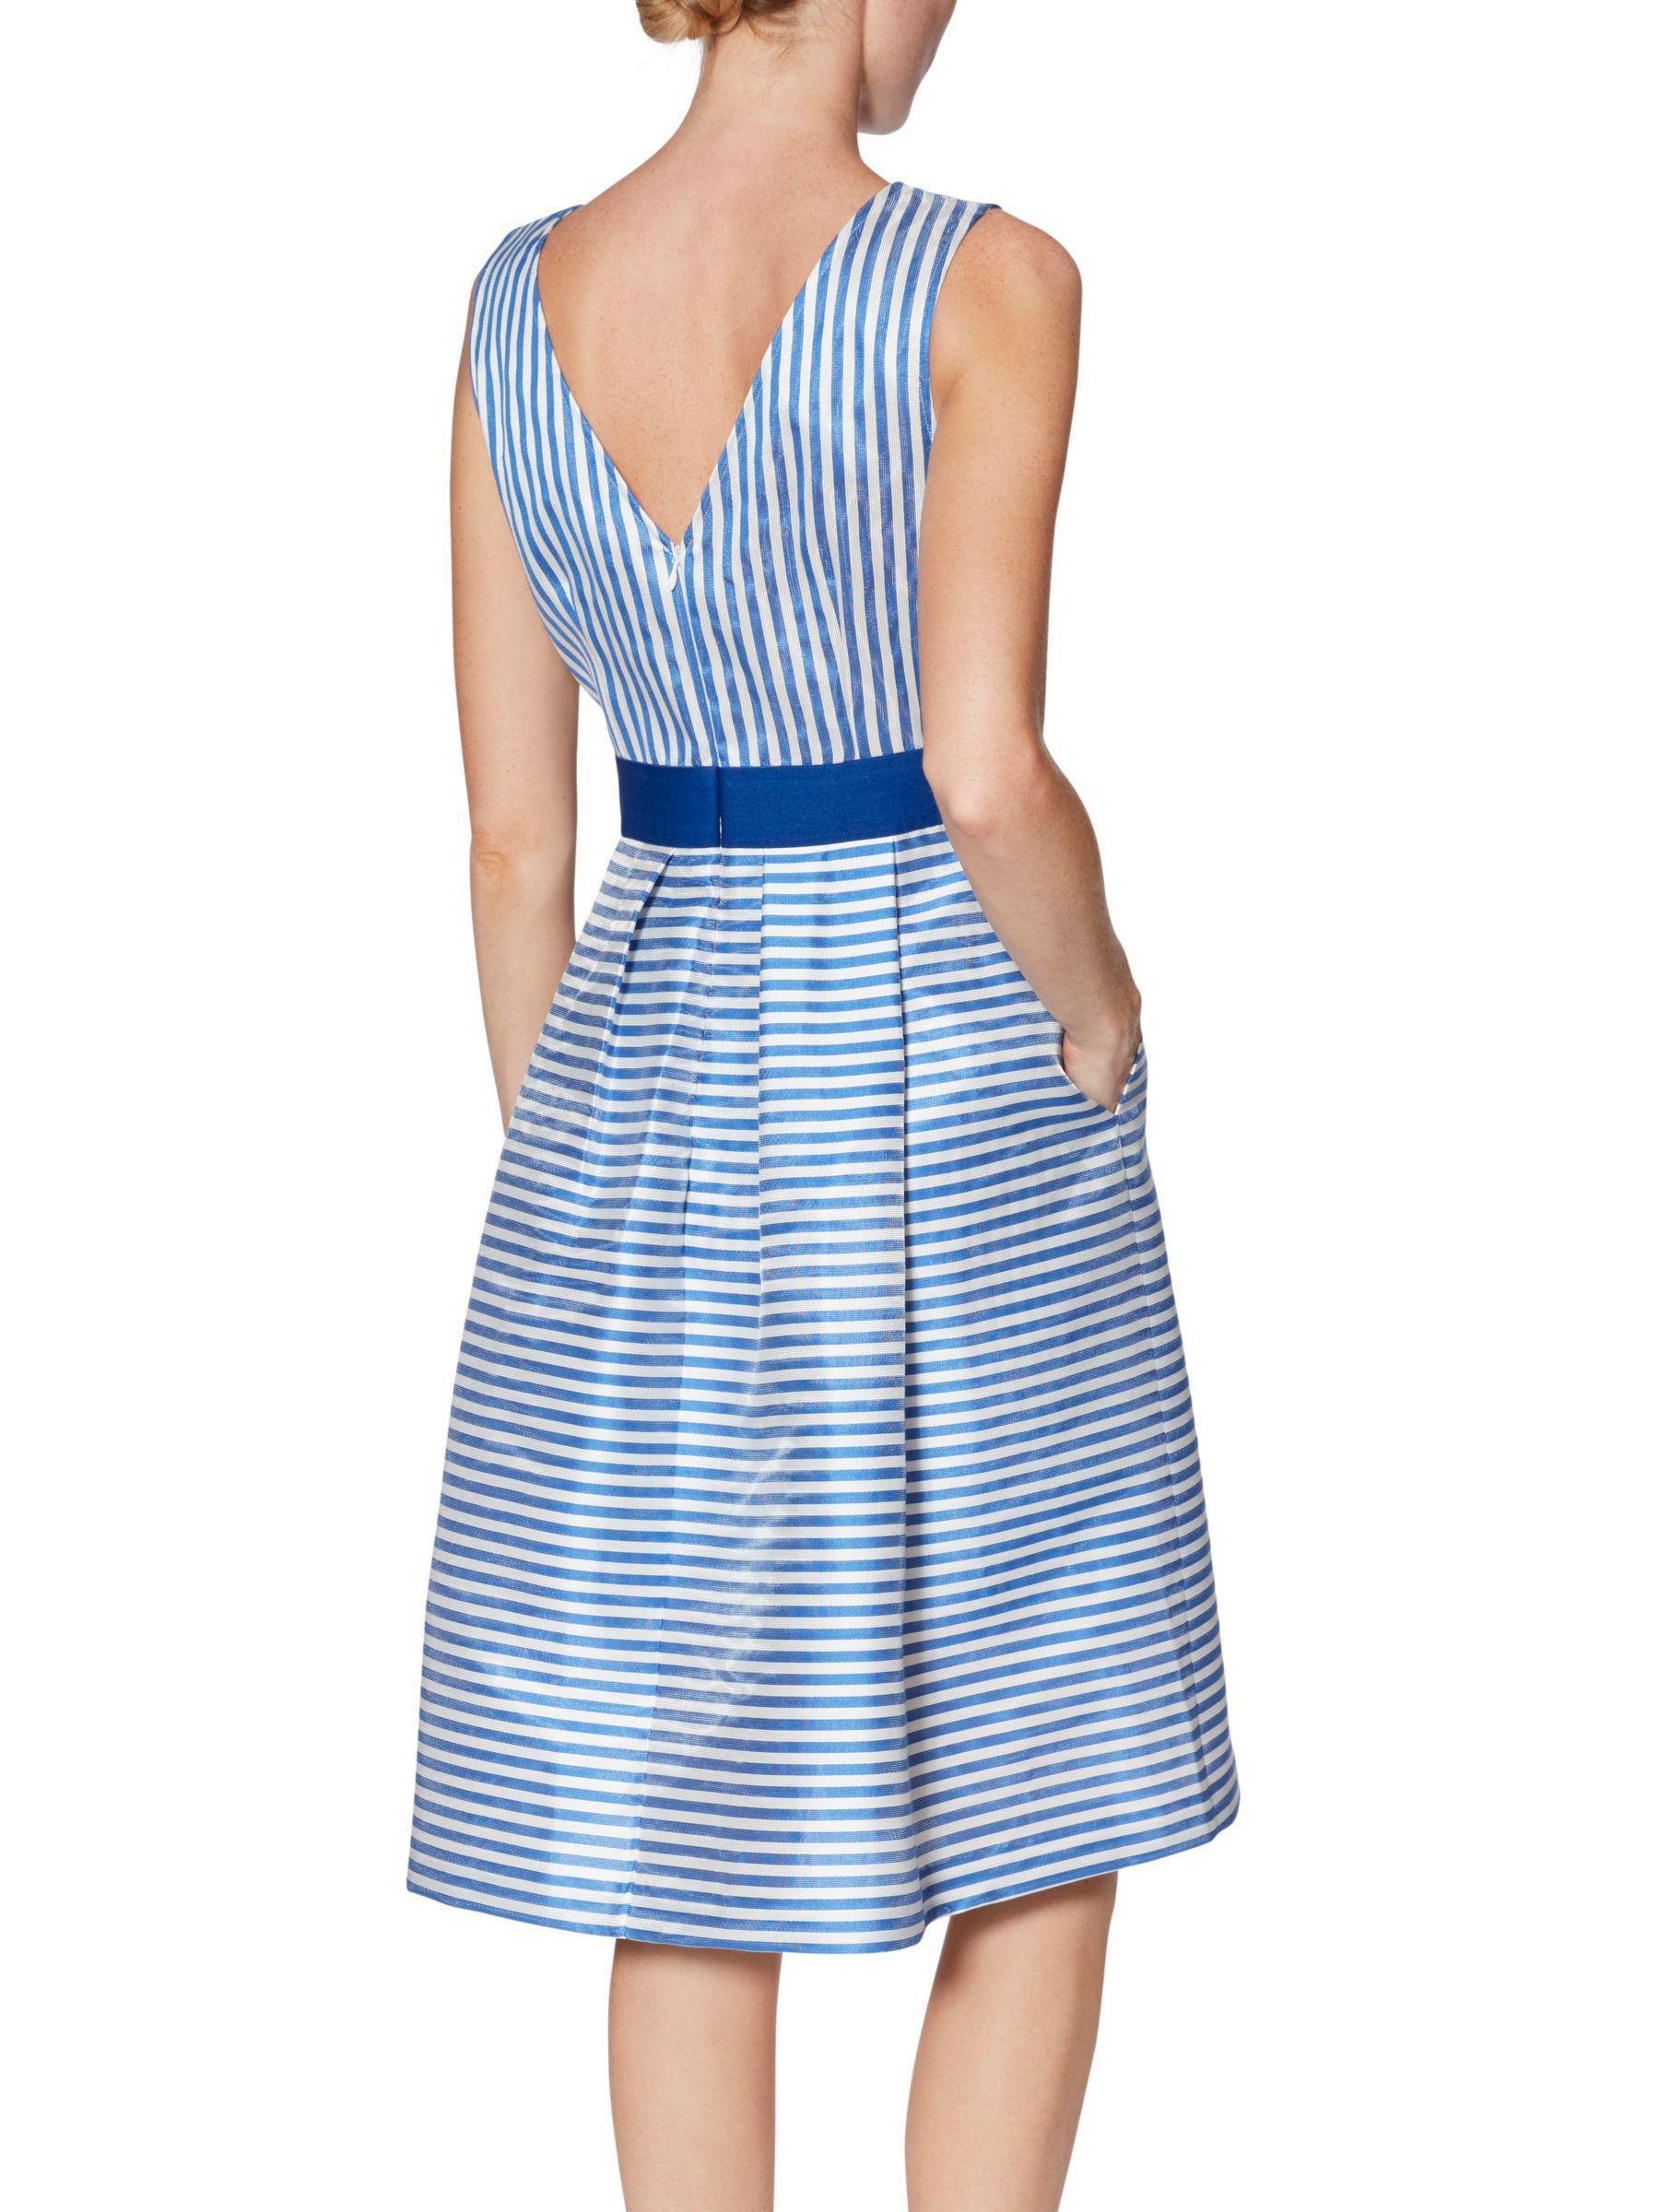 Lyst - John Lewis Gina Bacconi Elena Stripe Dress in Blue